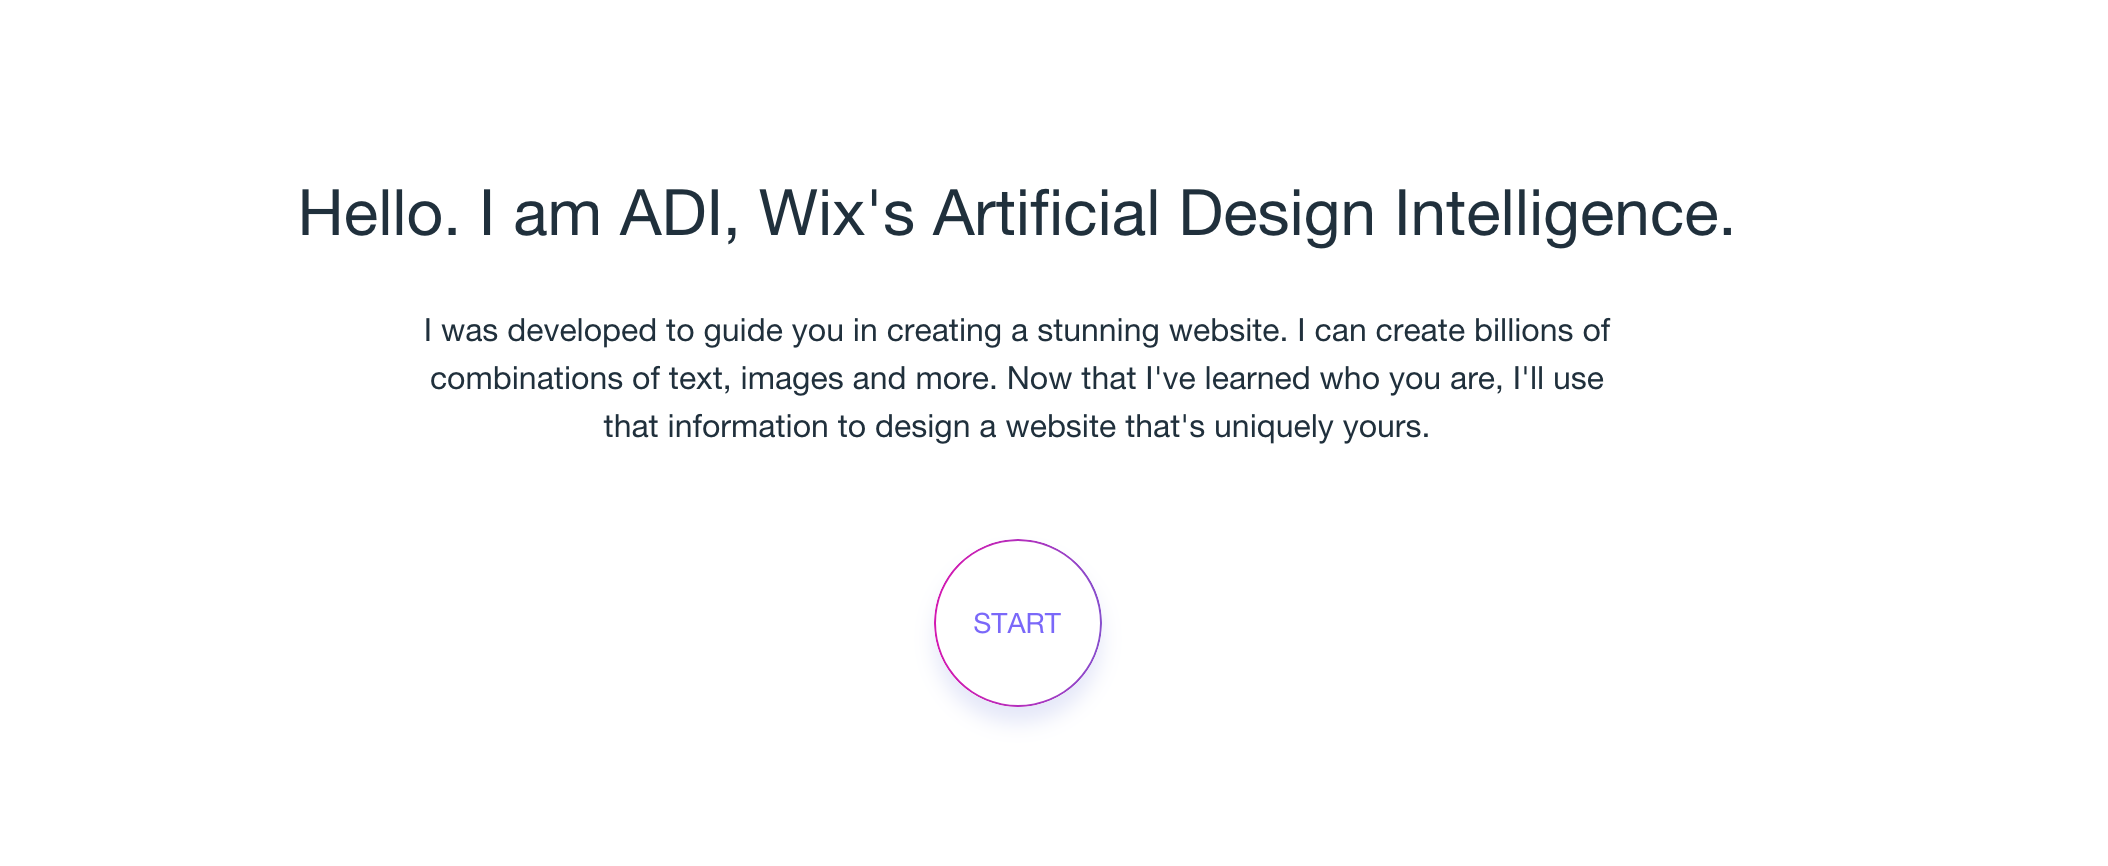 wix-step-3